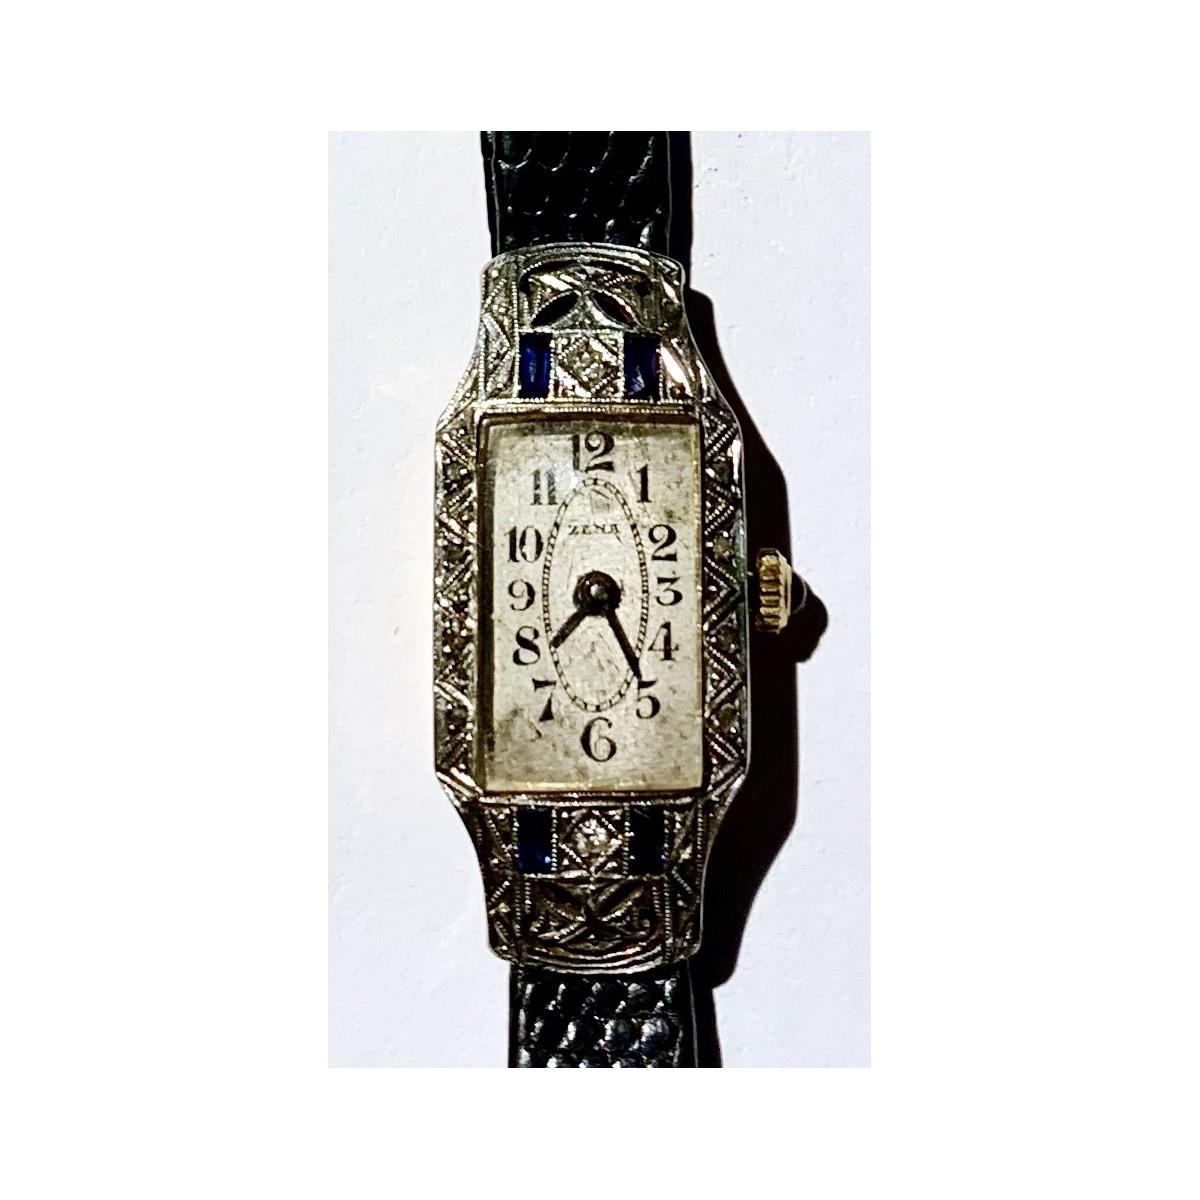 Titus women's watch, Geneve Switzerland, 18K gold